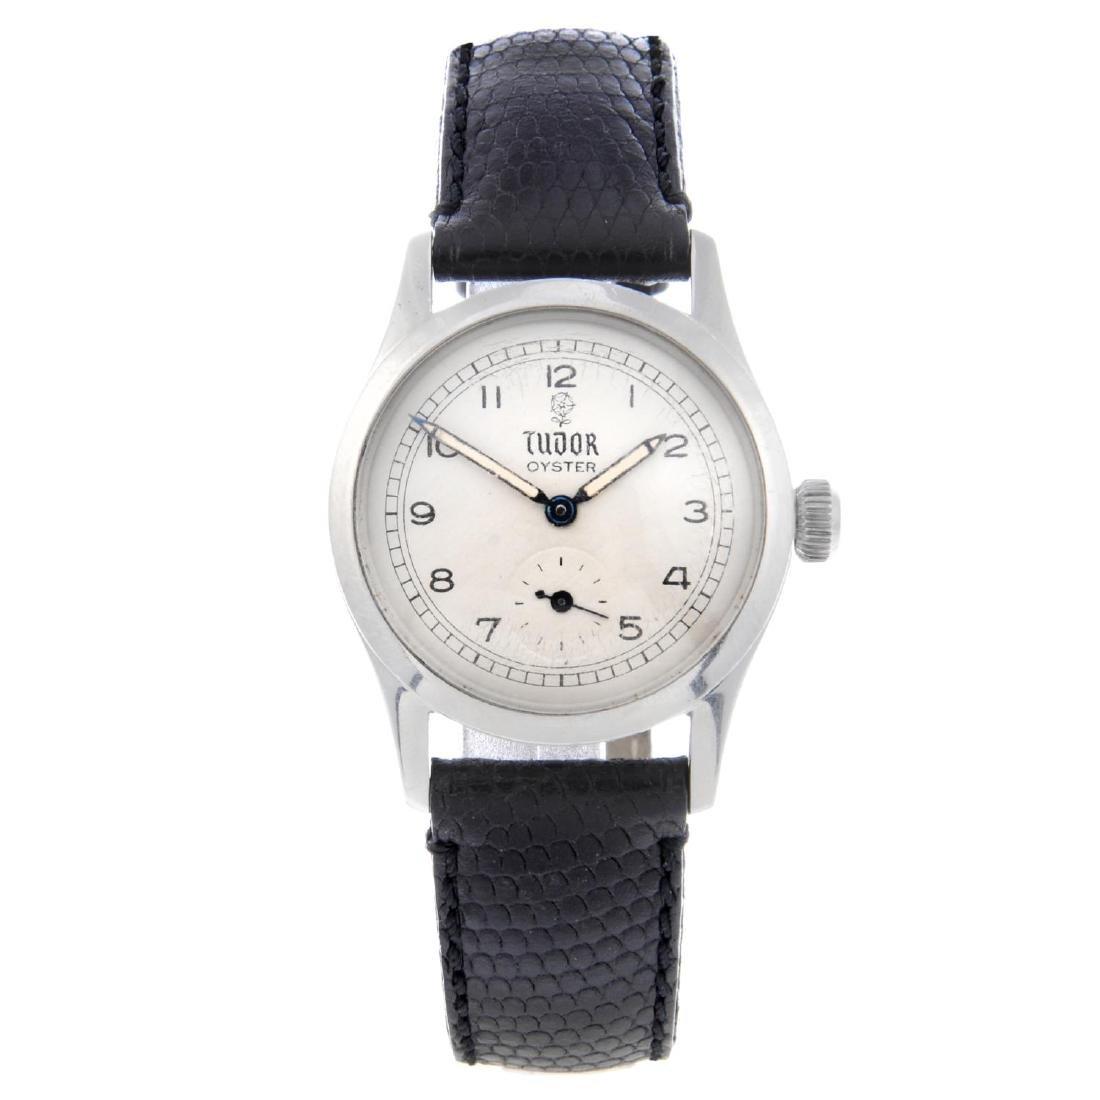 TUDOR - a gentleman's Oyster wrist watch. Stainless